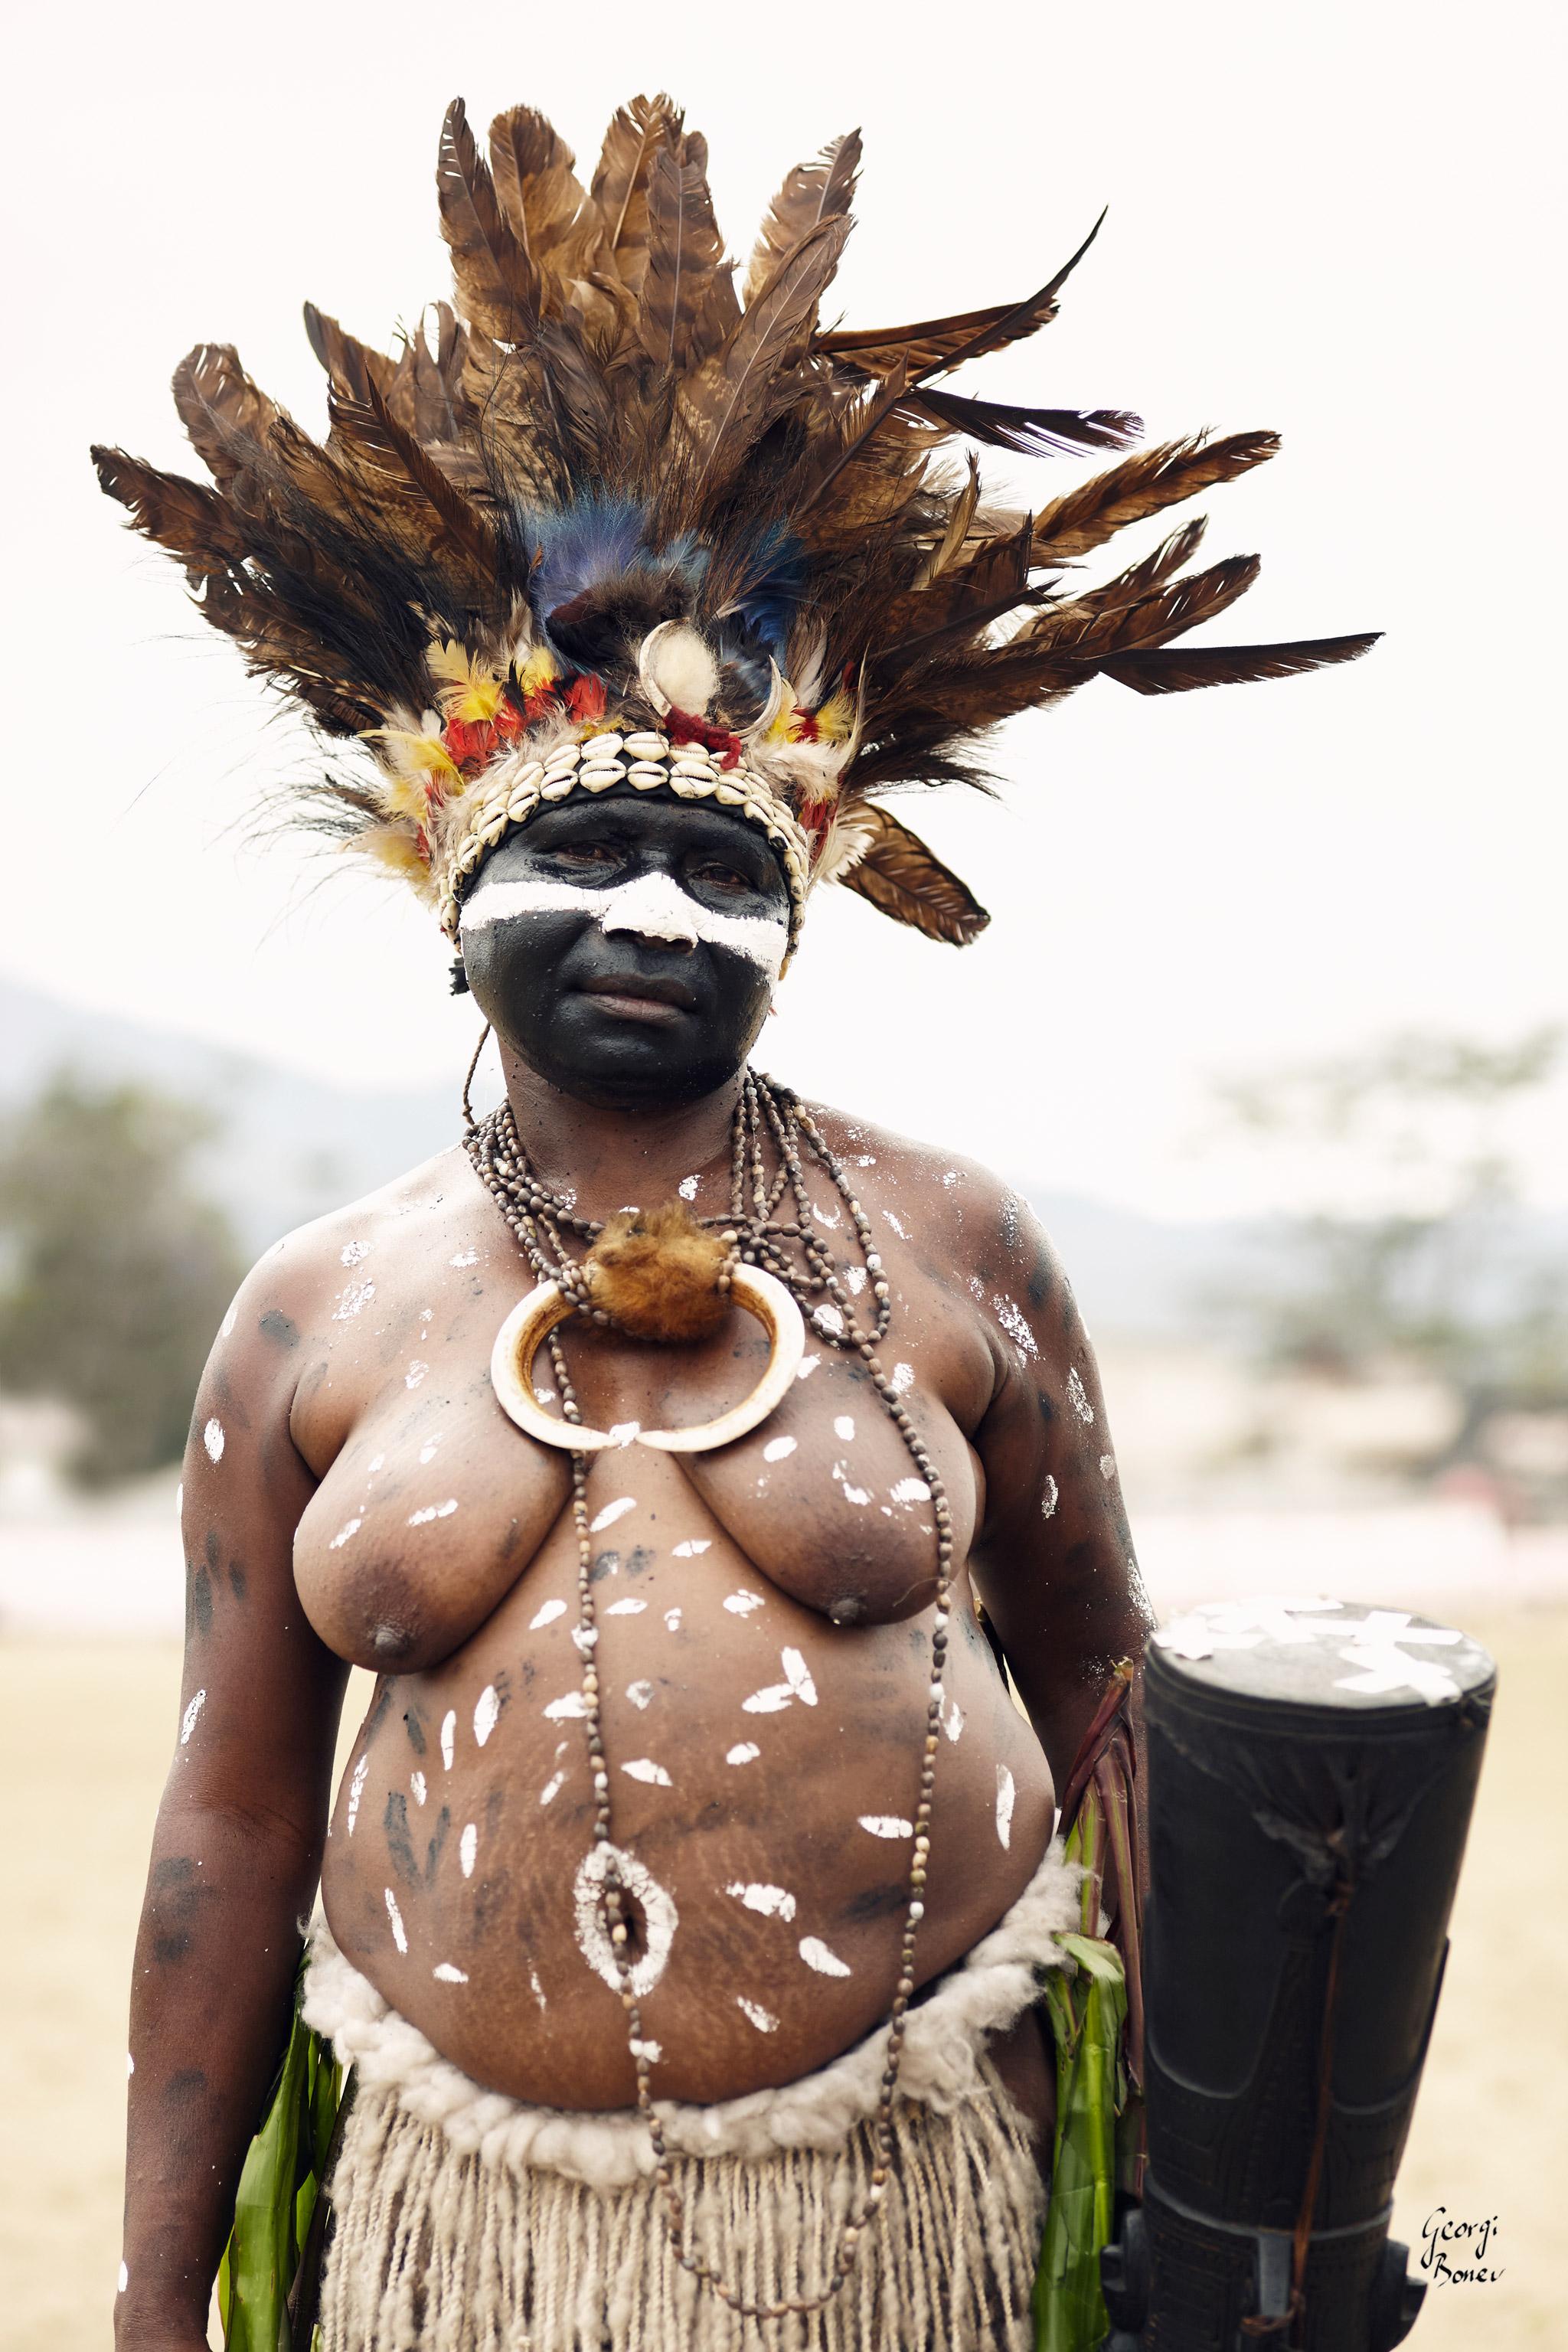 GILABAN WOMAN IN PAPUA NEW GUINEA